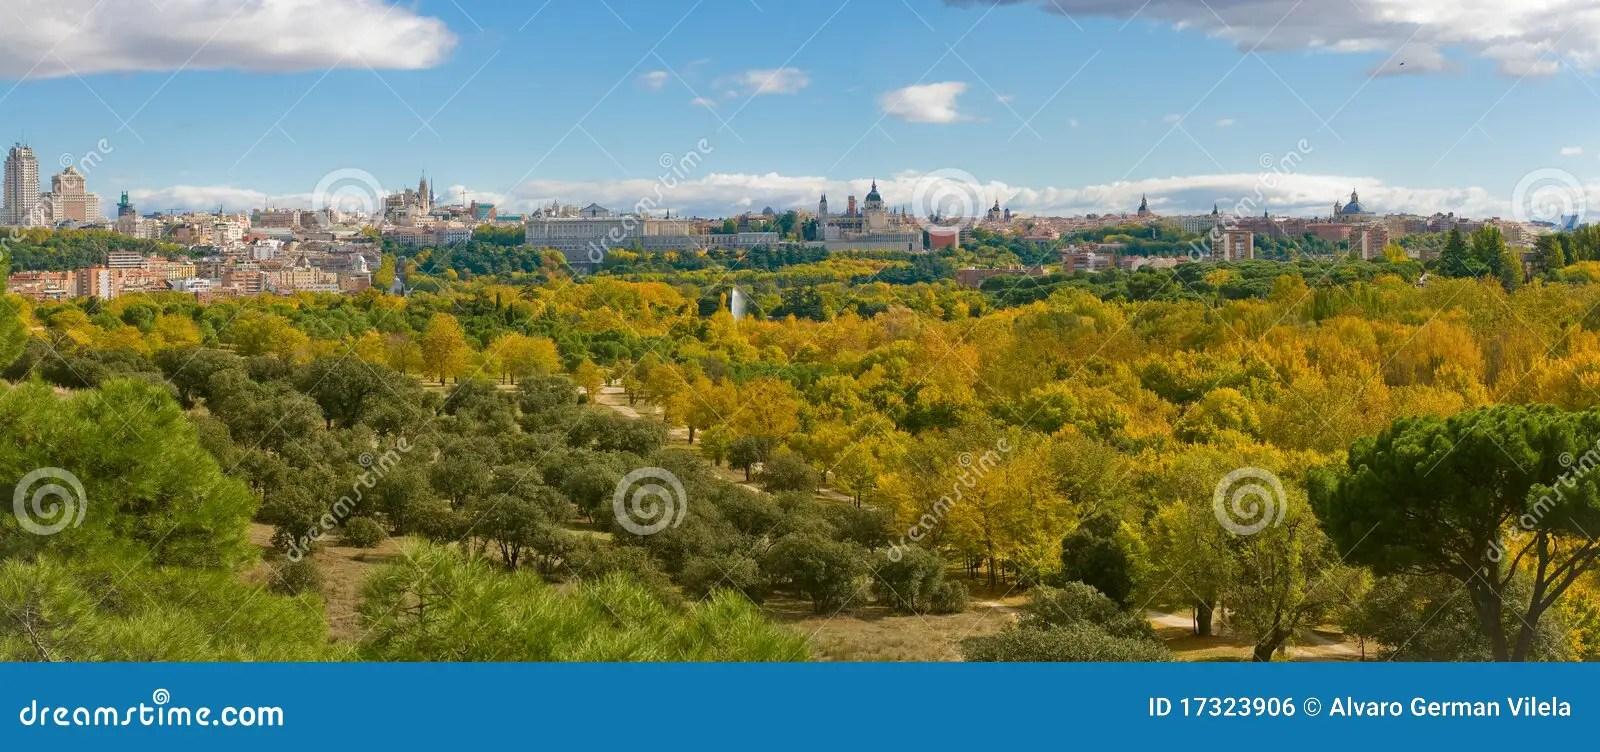 autumn in casa de campo madrid spain royalty free stock image